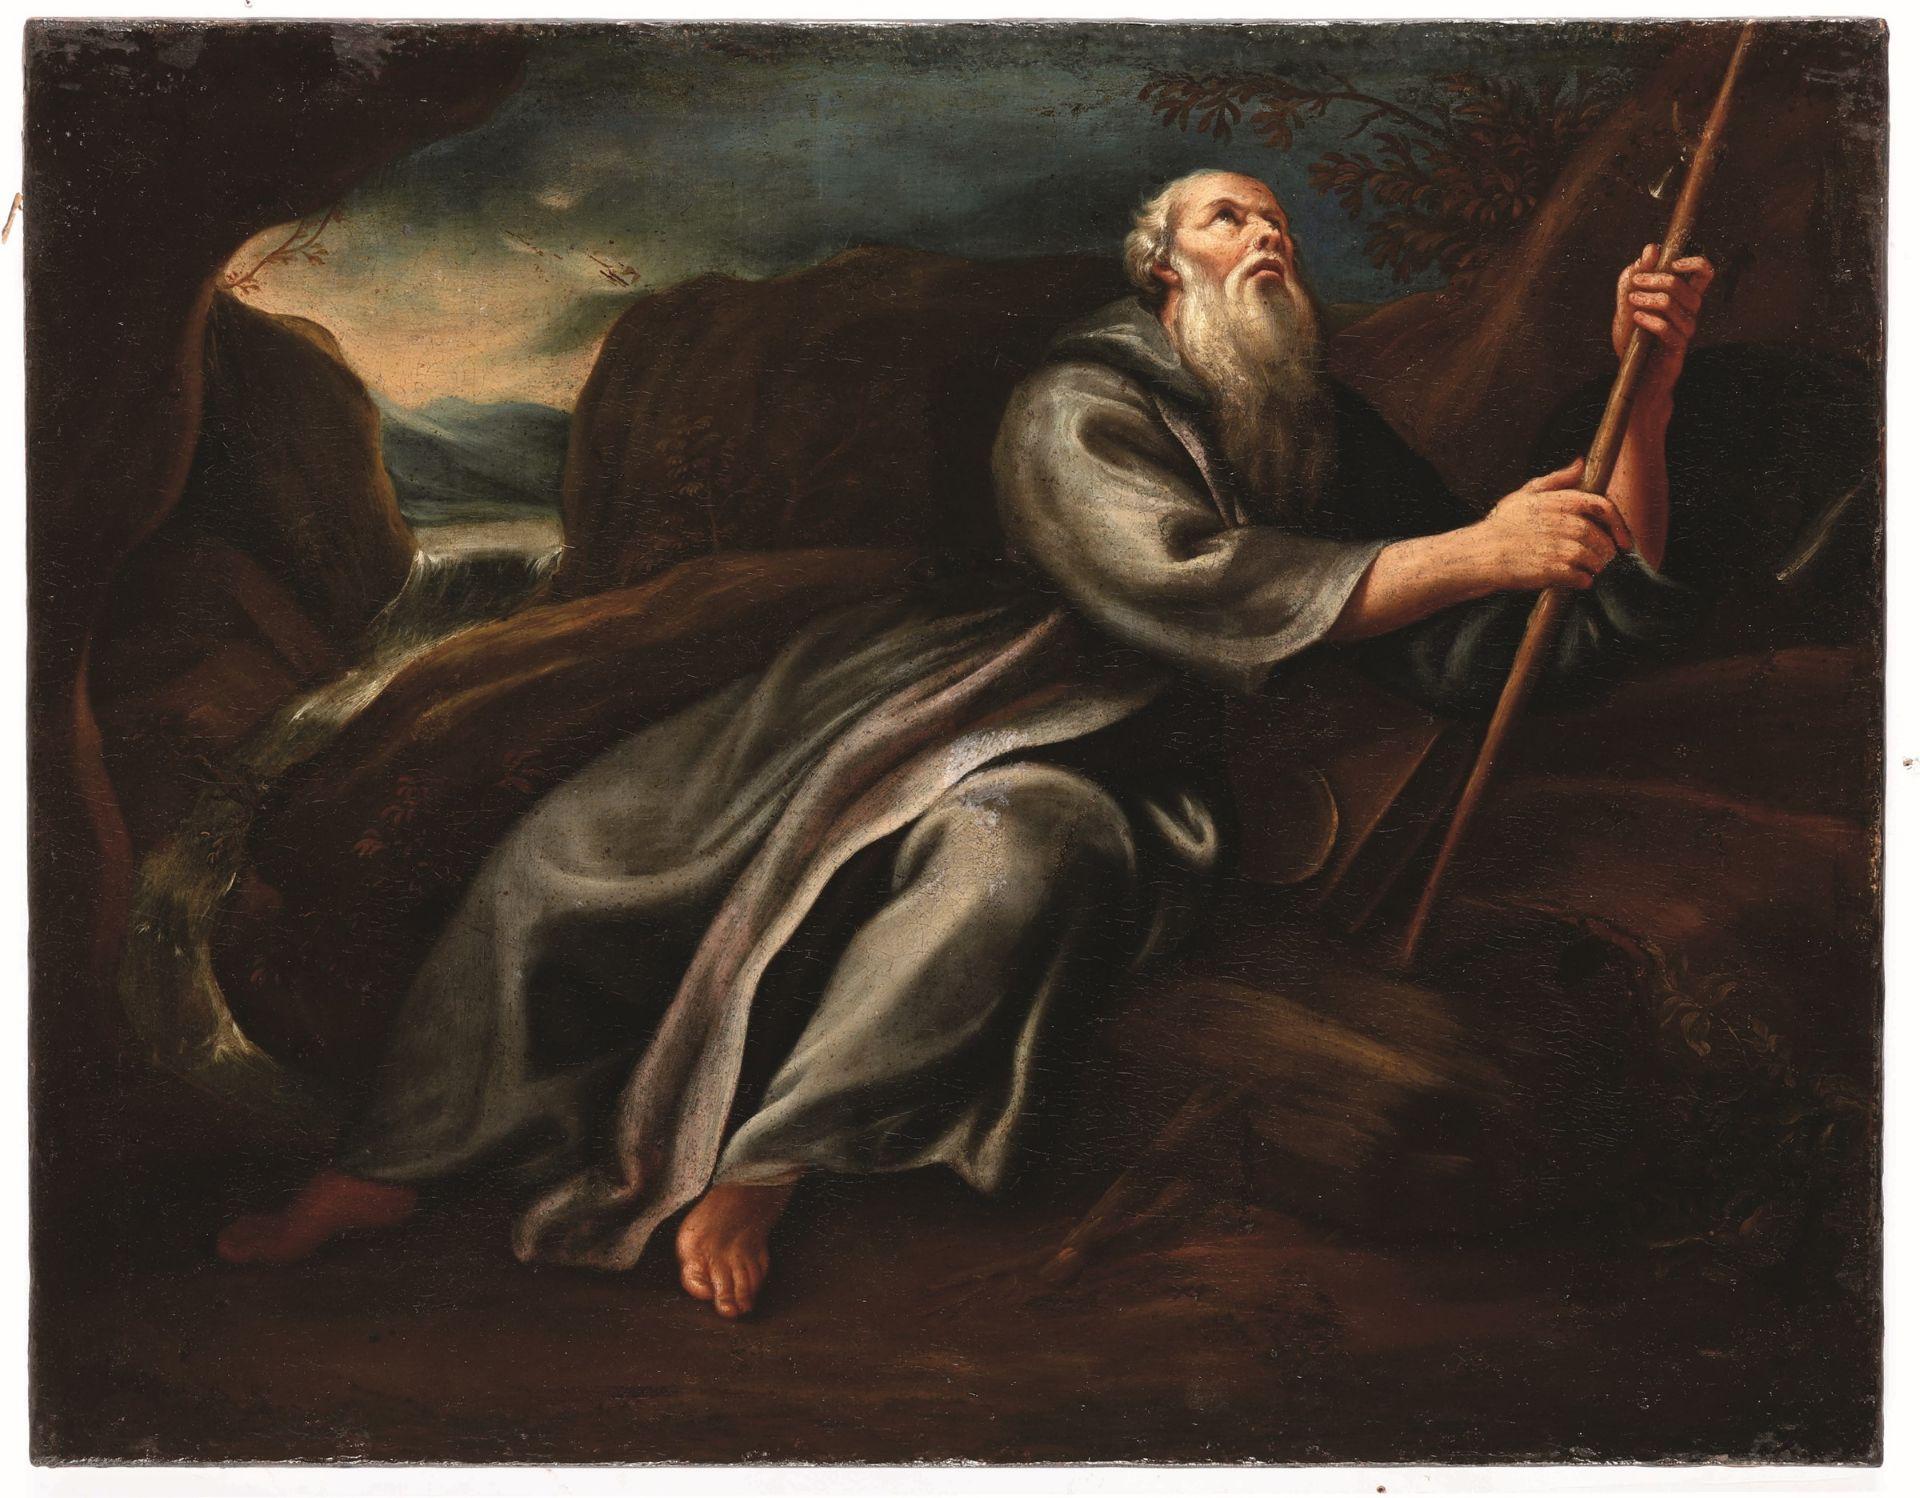 Los 14 - Scuola genovese del XVIII secolo, S. Antonio Abate - olio su tela, cm 57x73 -